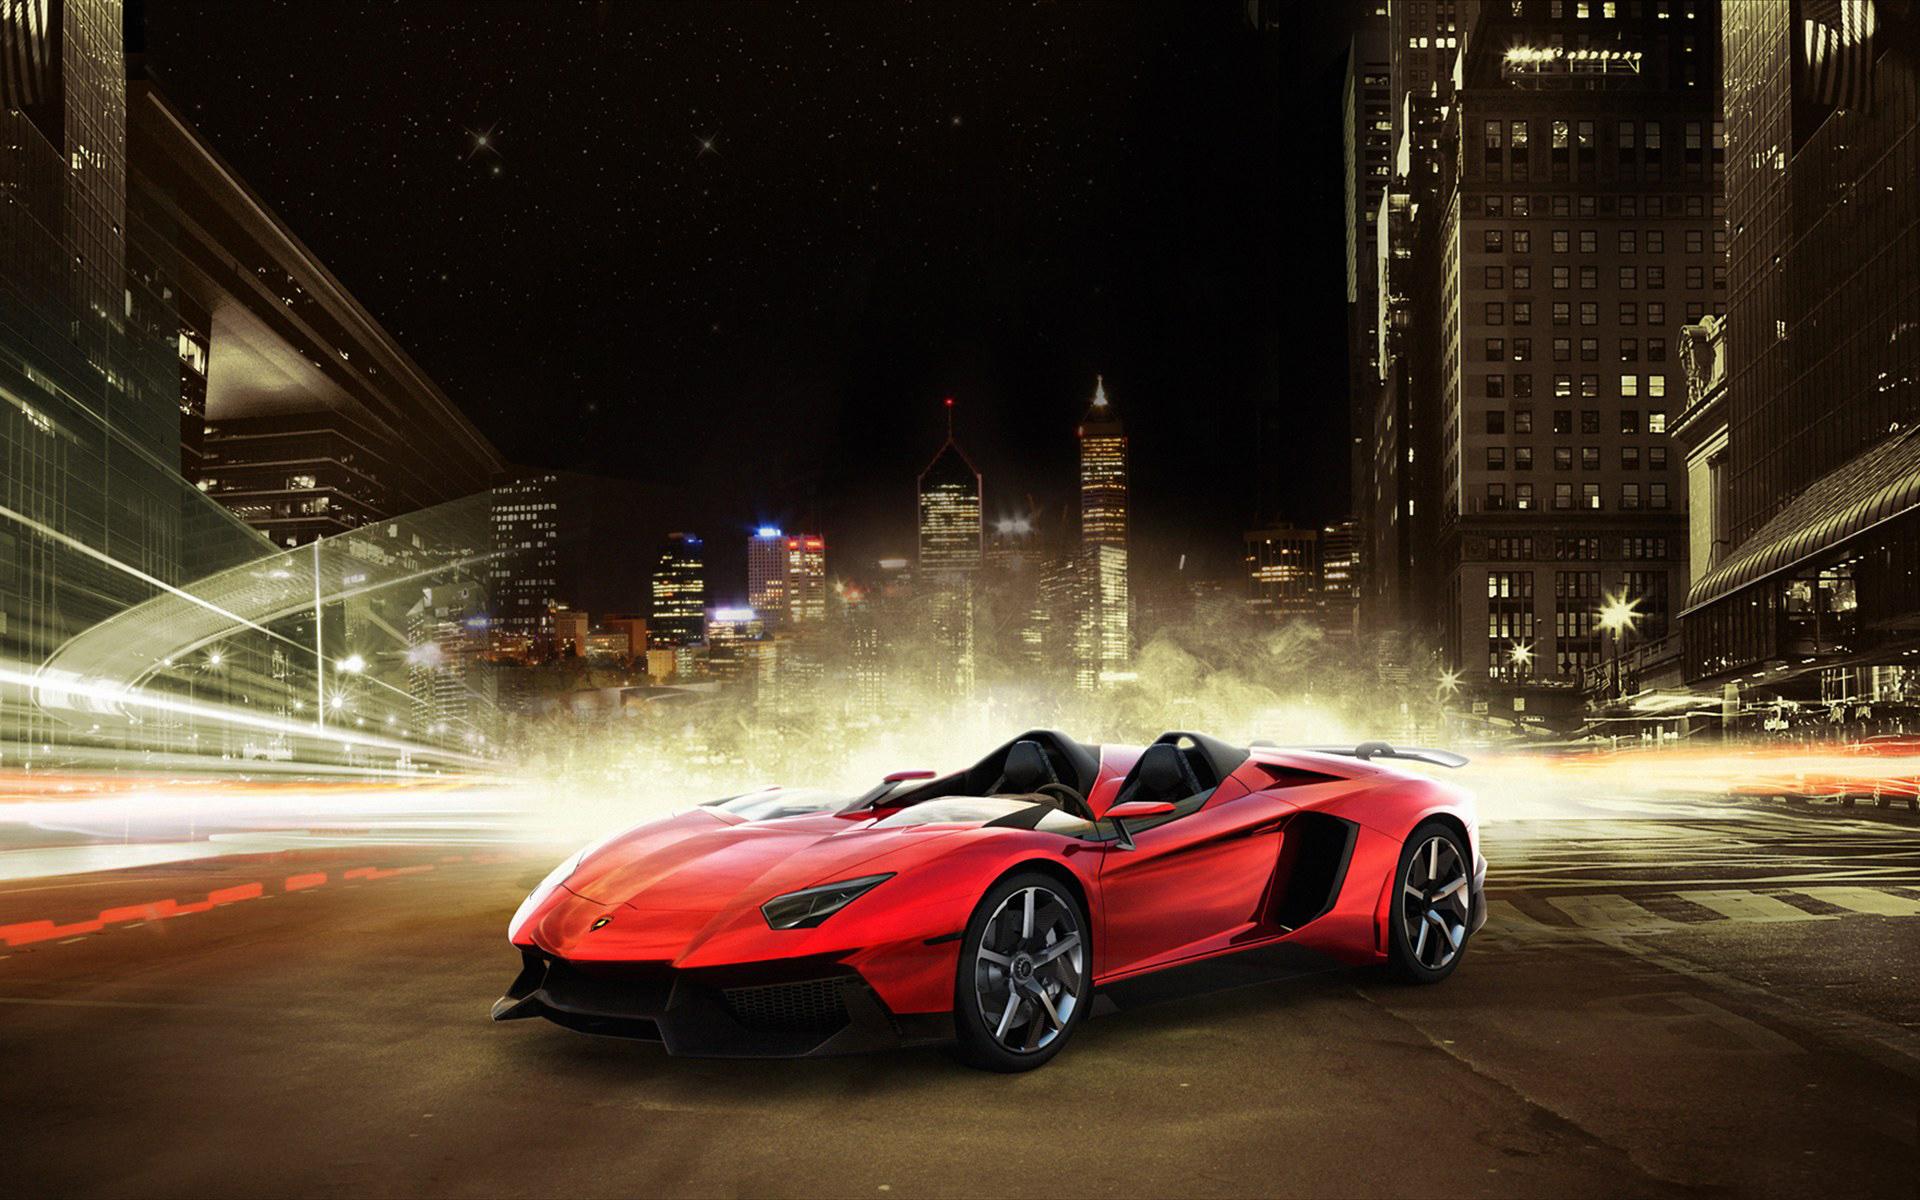 Bmw Cars Wallpapers 2012 Hd 2012 Lamborghini Aventador J Wallpaper Hd Car Wallpapers